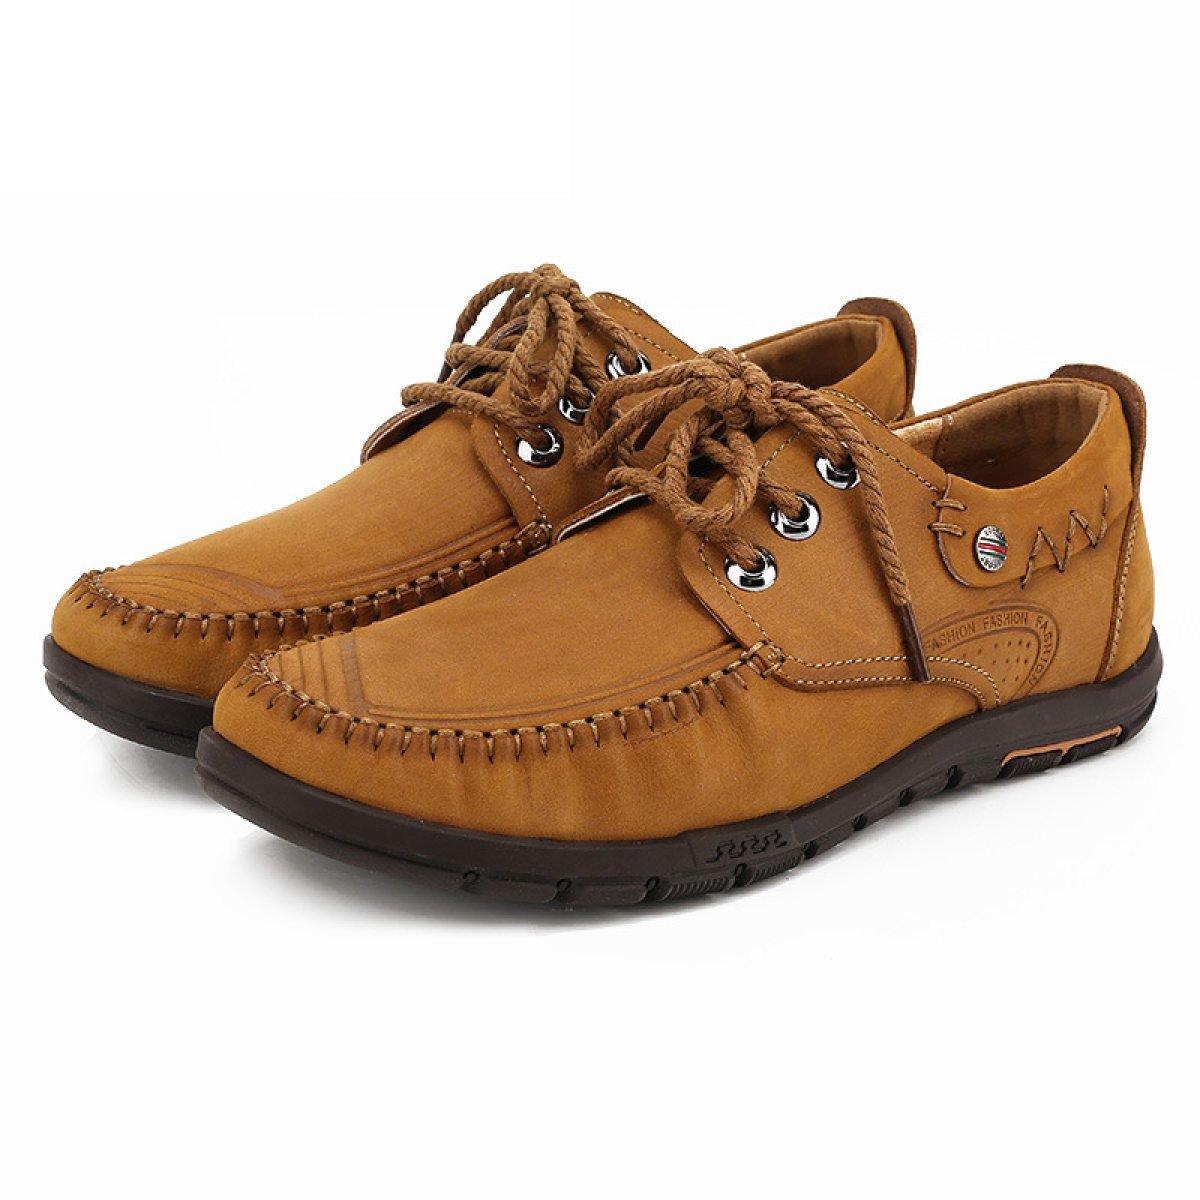 OEMPD Breathable Beiläufige Schuhe der Neuen Männer Männer Männer Wedding Schuhe Klassische Echte Leder-Schuhe der Oxford-Männer  a637cb